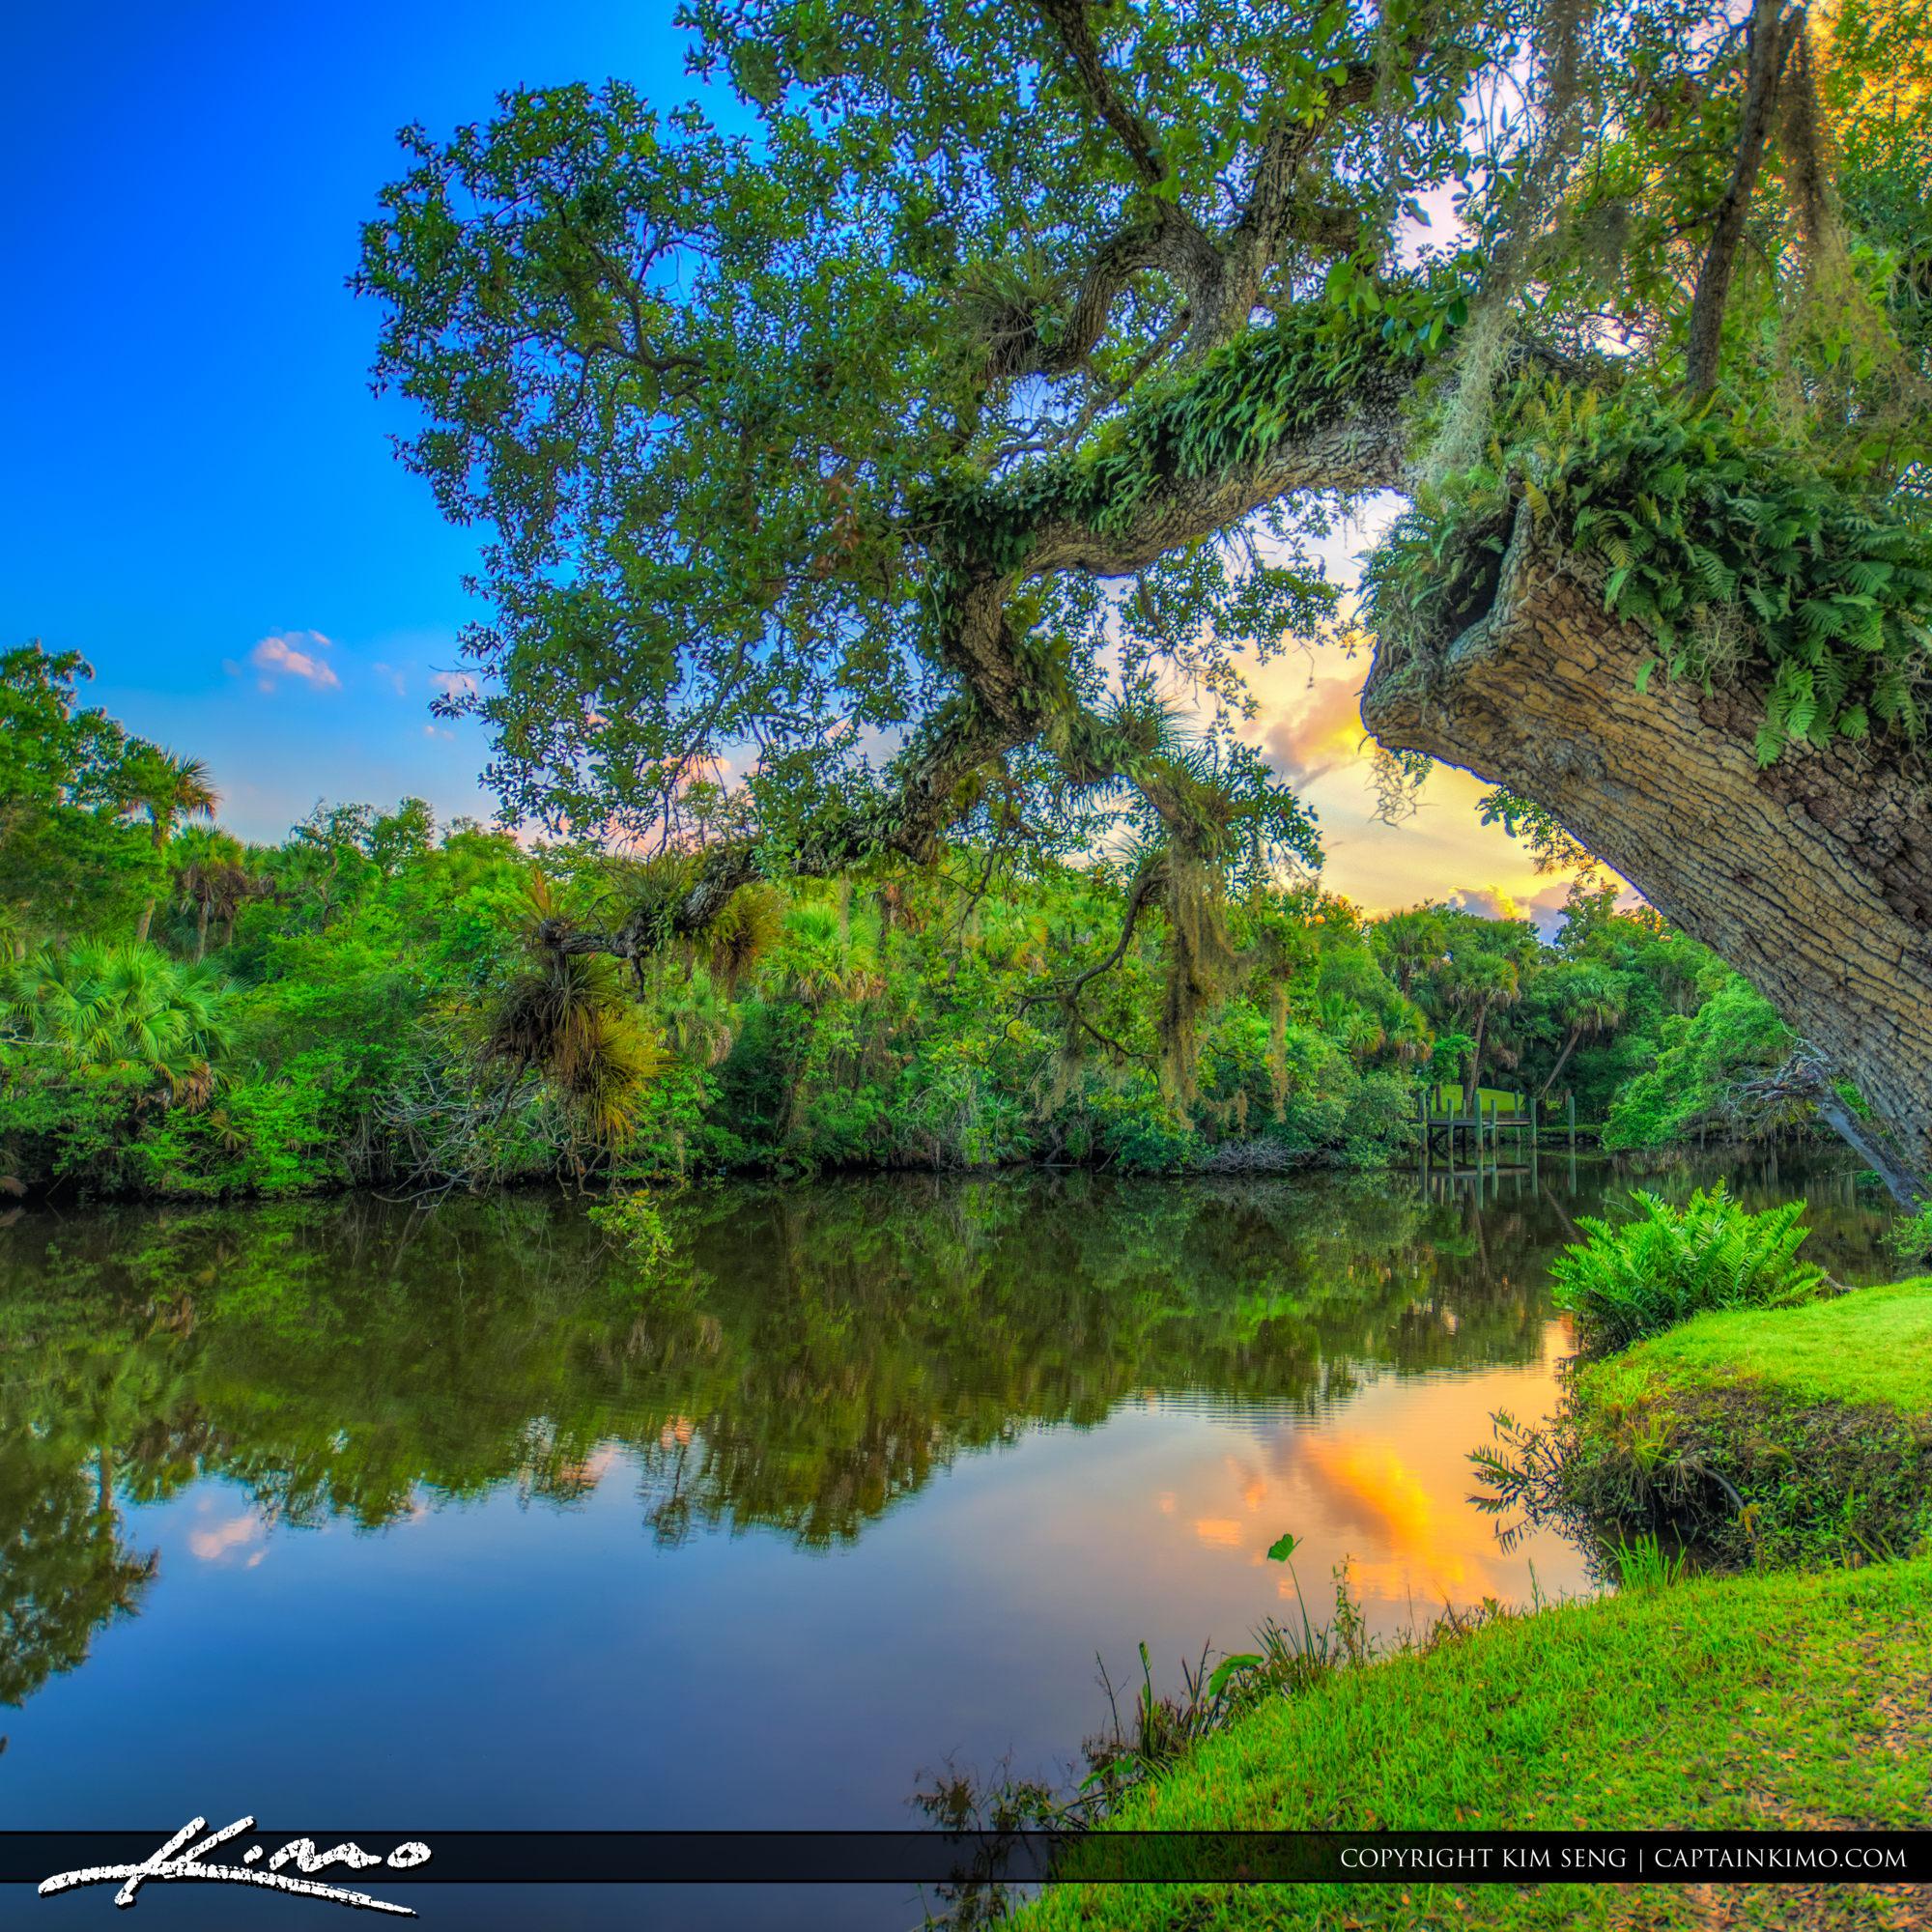 St Lucie River at White City Park Fort Pierce Florida